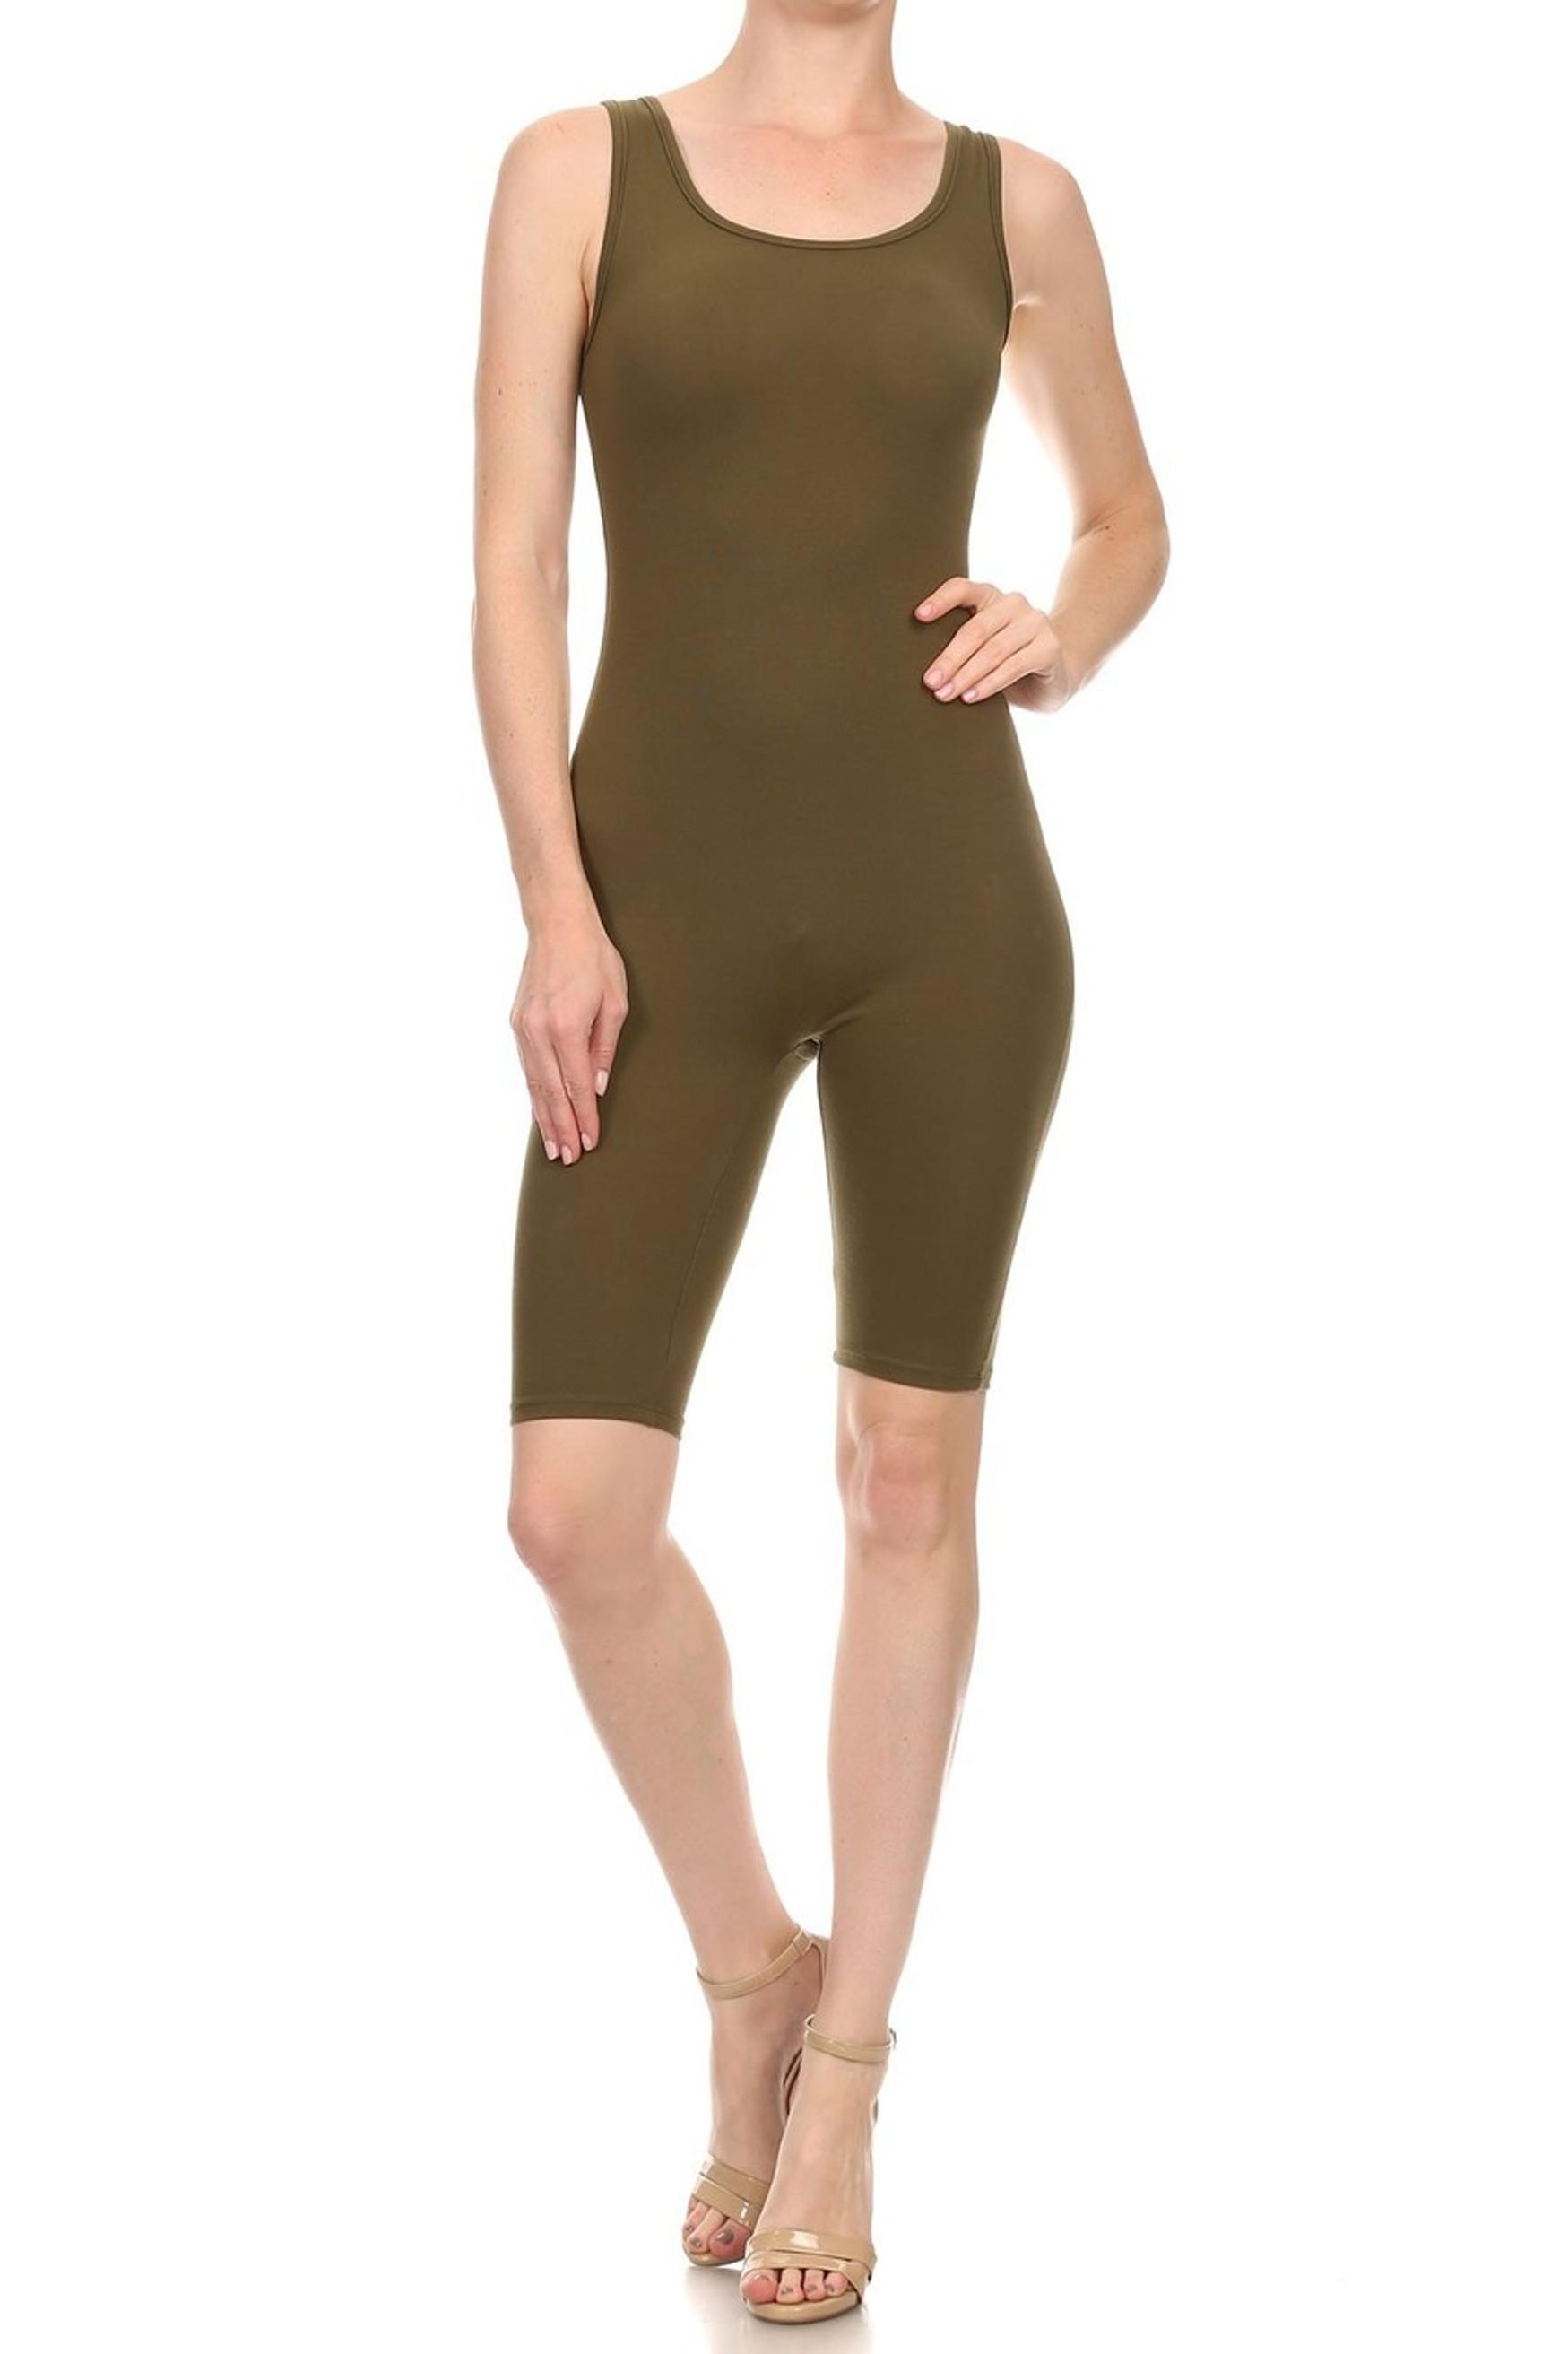 USA Basic Cotton Thigh High Jumpsuit